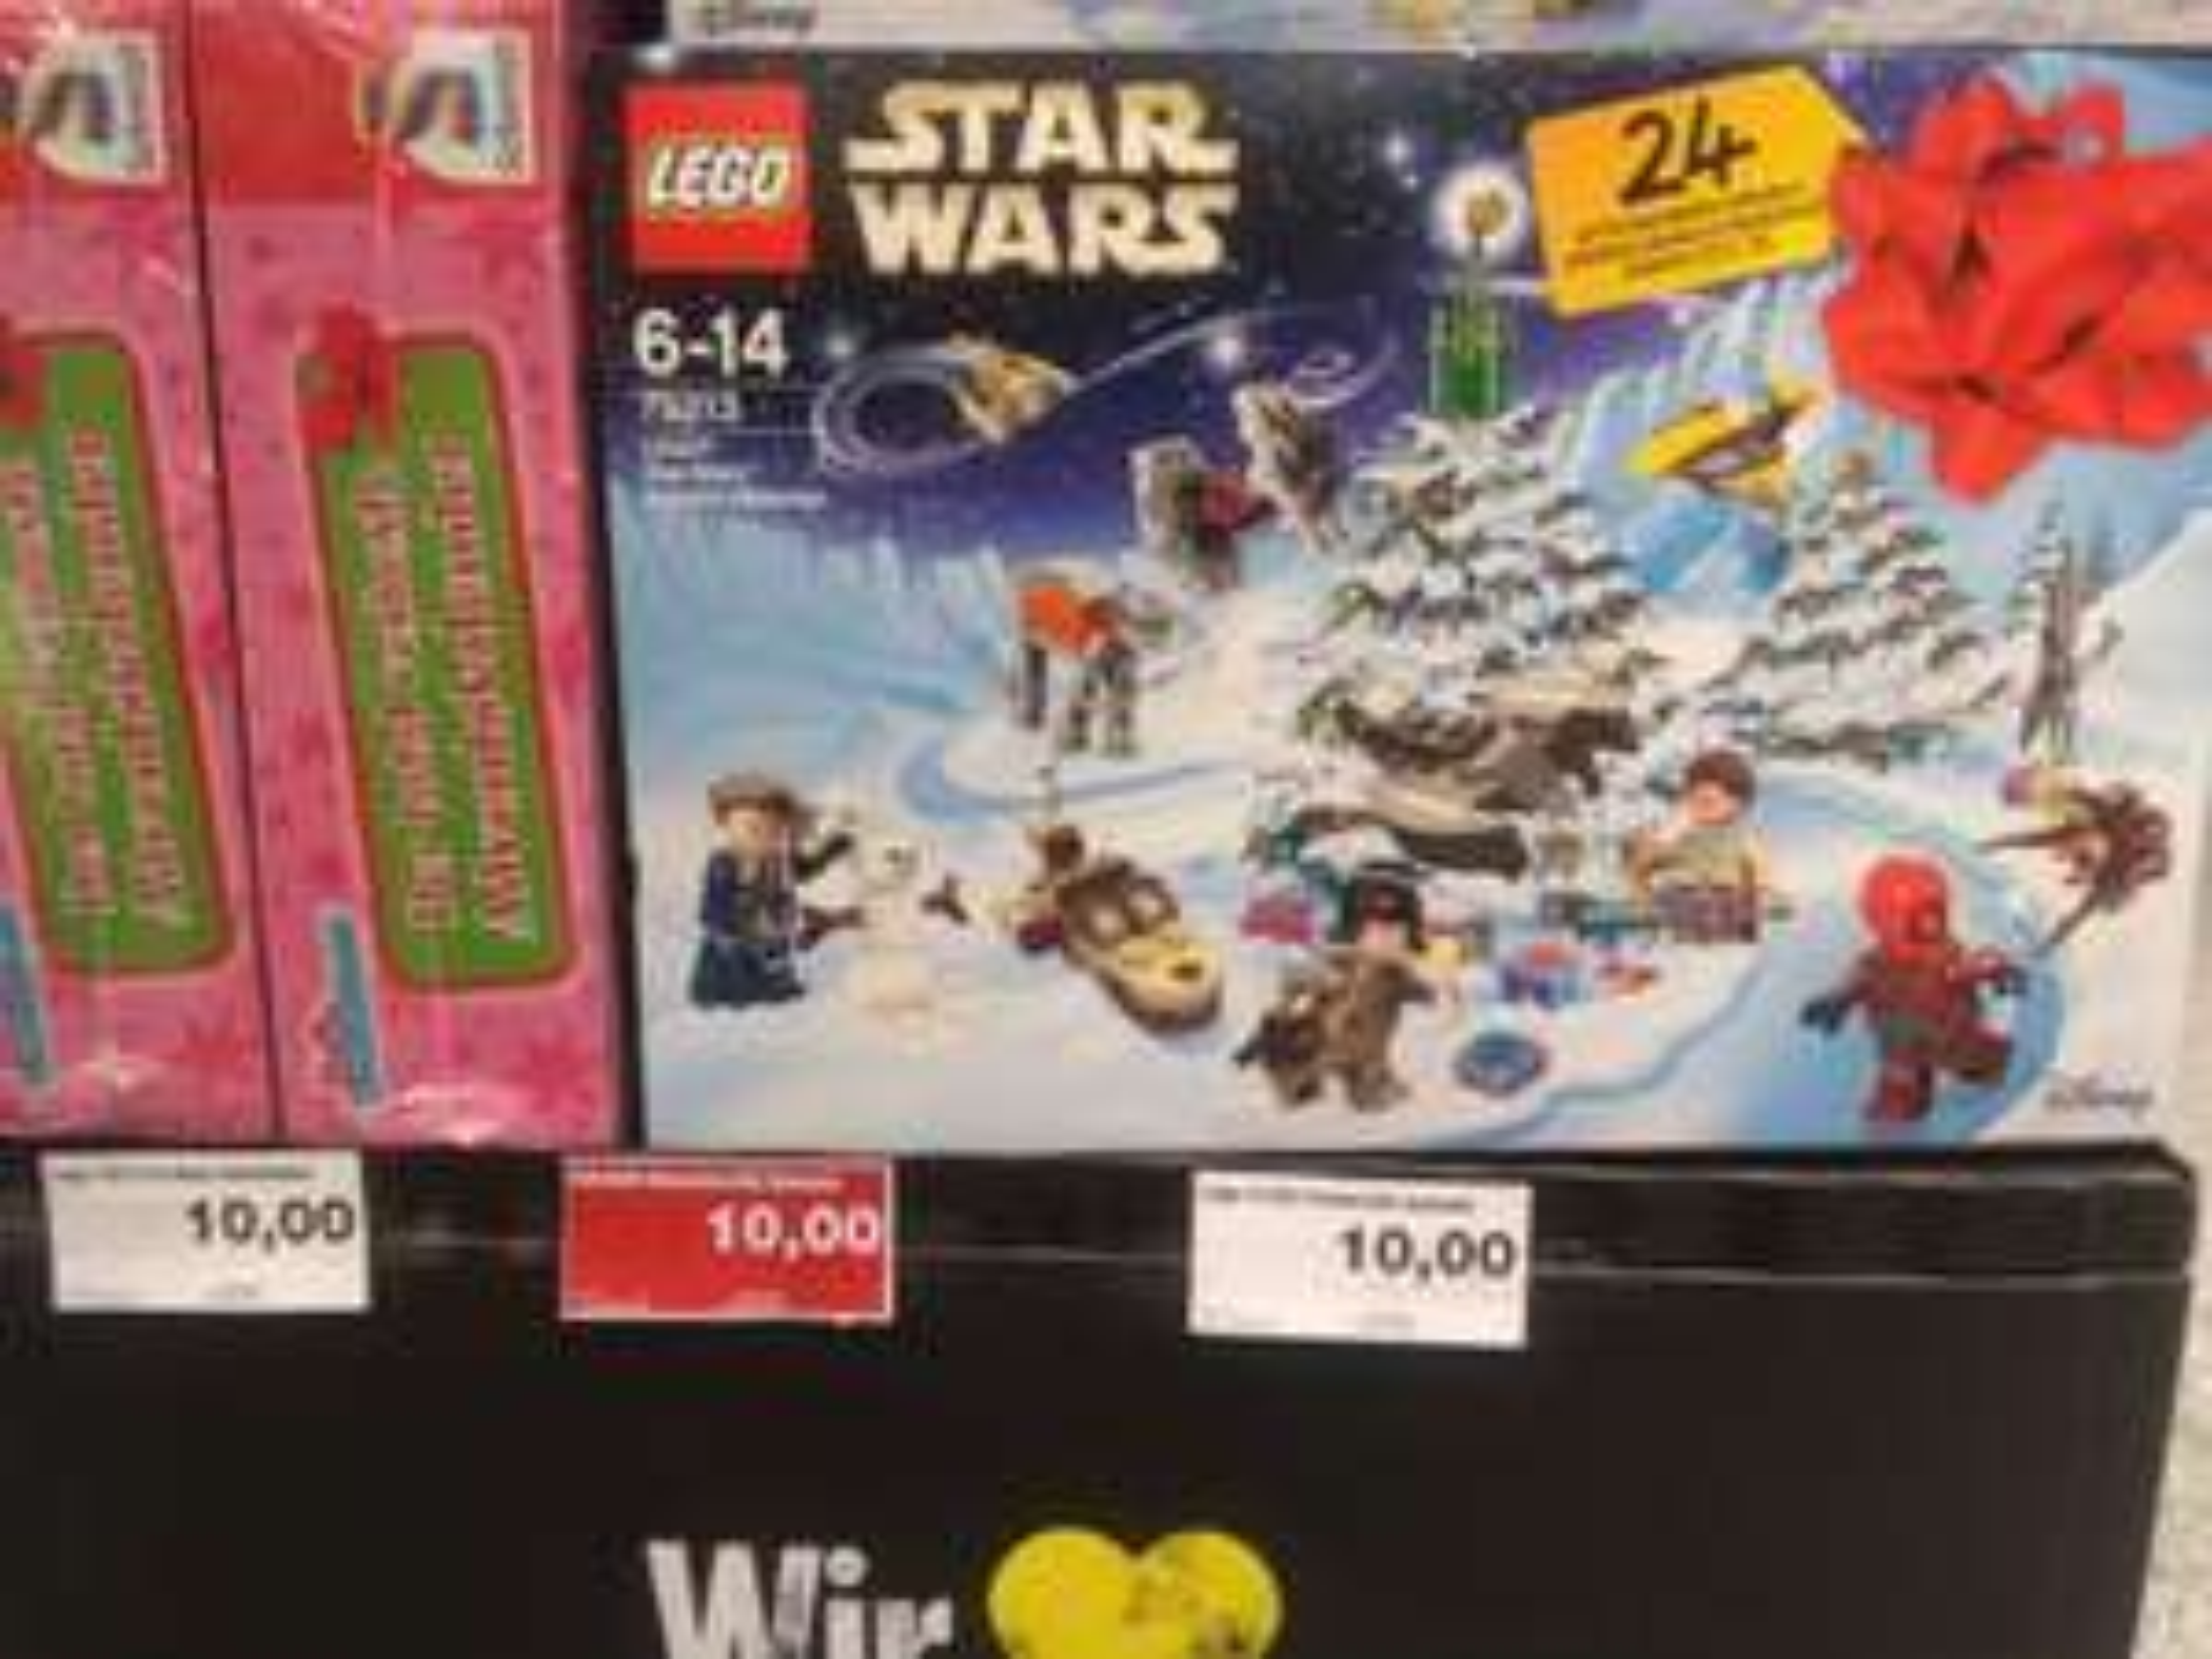 [Edeka PLZ 22949] Lego Star Wars Adventskalender 75213